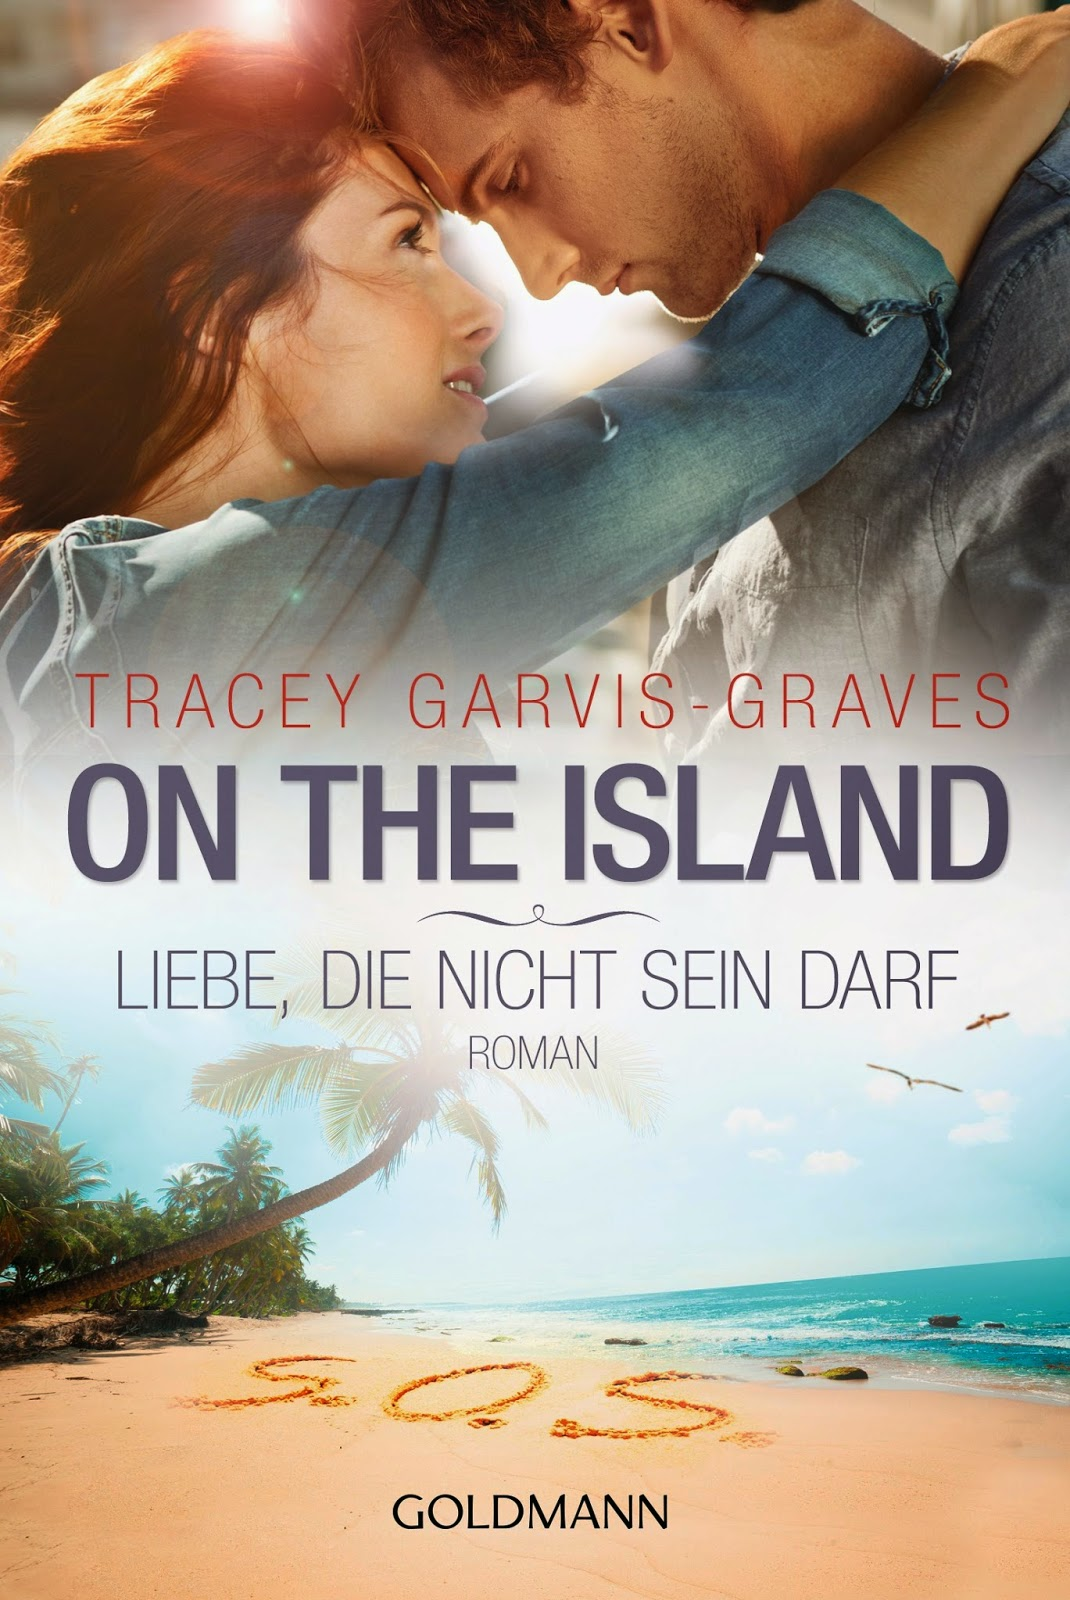 http://www.amazon.de/Island-Liebe-nicht-sein-darf/dp/3442481759/ref=sr_1_1_twi_1?ie=UTF8&qid=1423321197&sr=8-1&keywords=on+the+island.+liebe+die+nicht+sein+darf